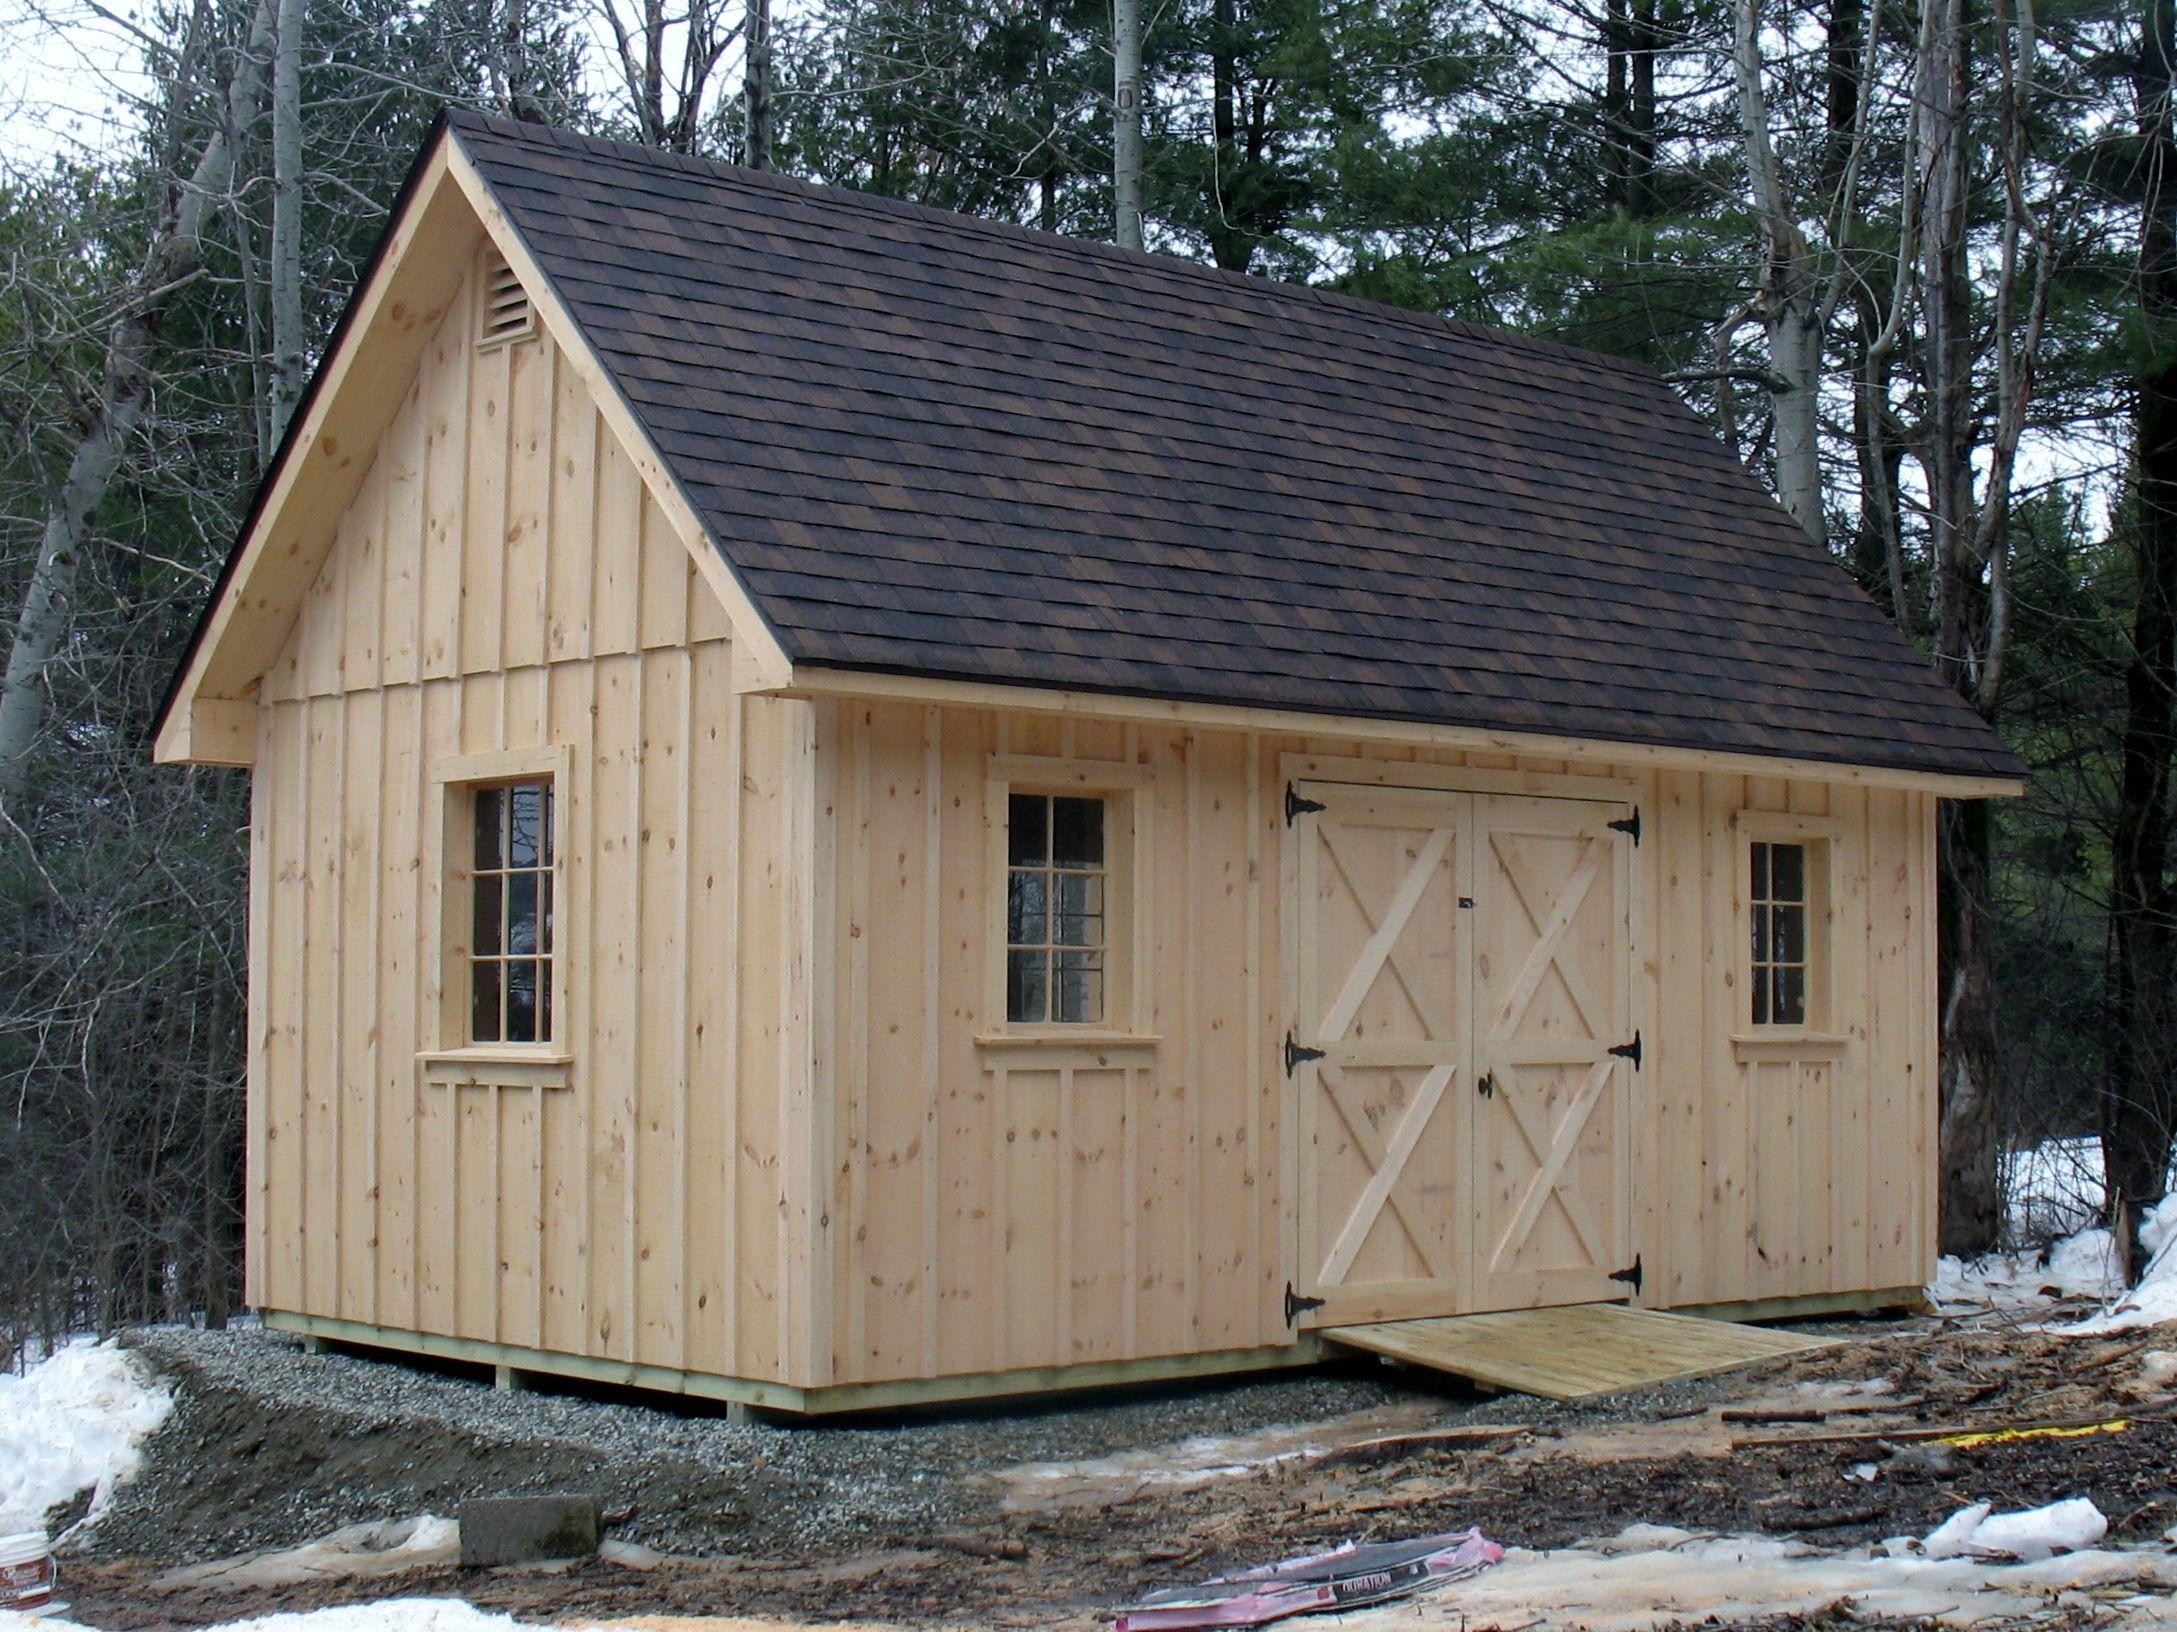 Garden Sheds Vermont pinvermont custom sheds on williston, vermont | pinterest